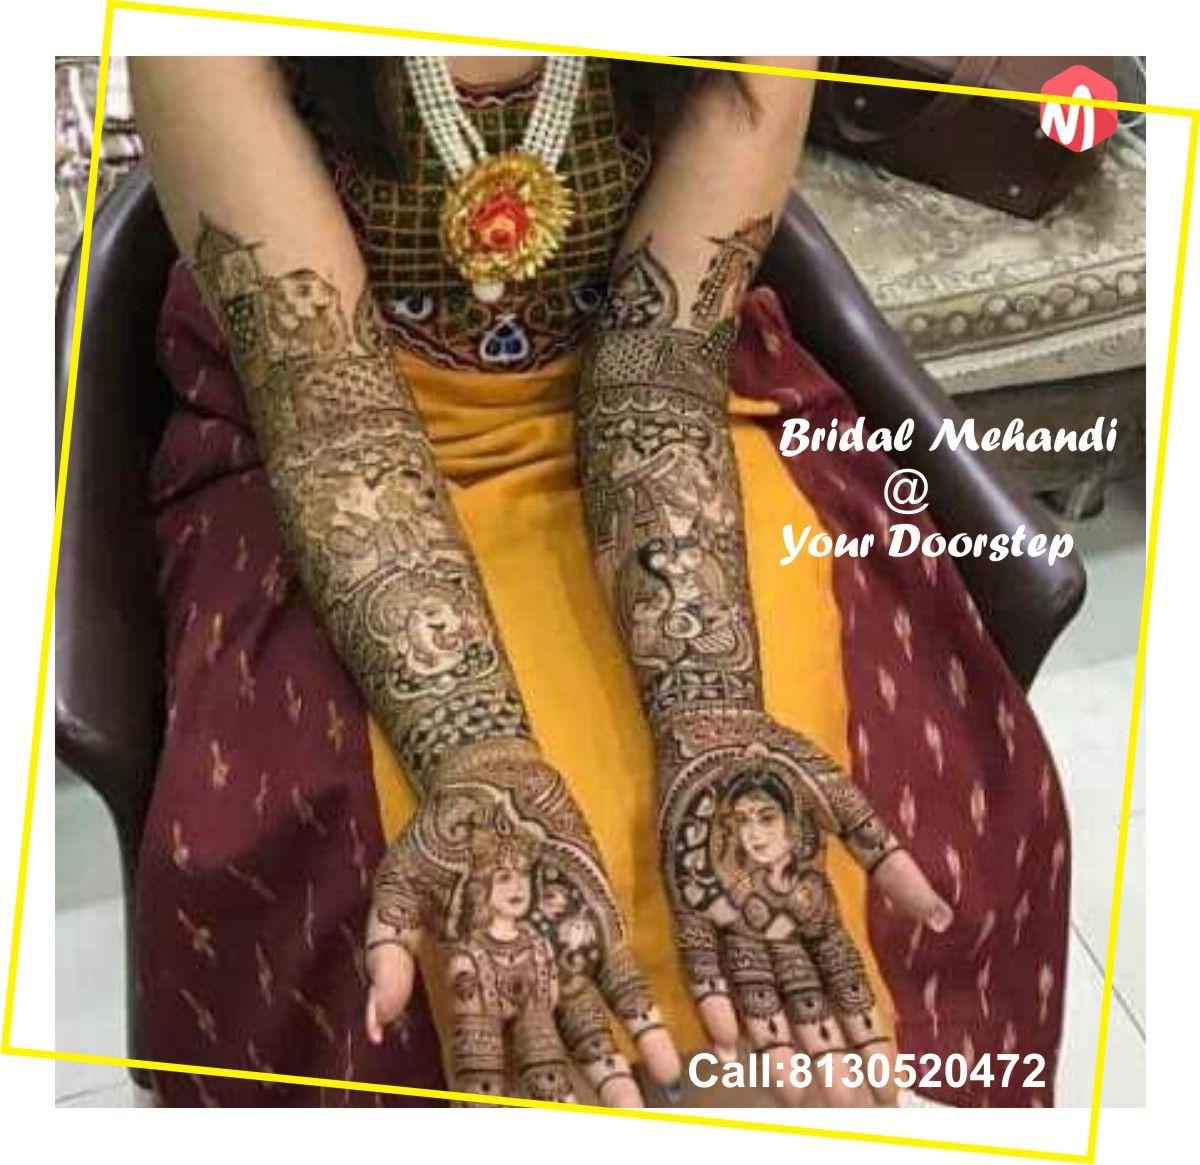 Bridal Mehndi Pre bridal, Top beauty products, Pre